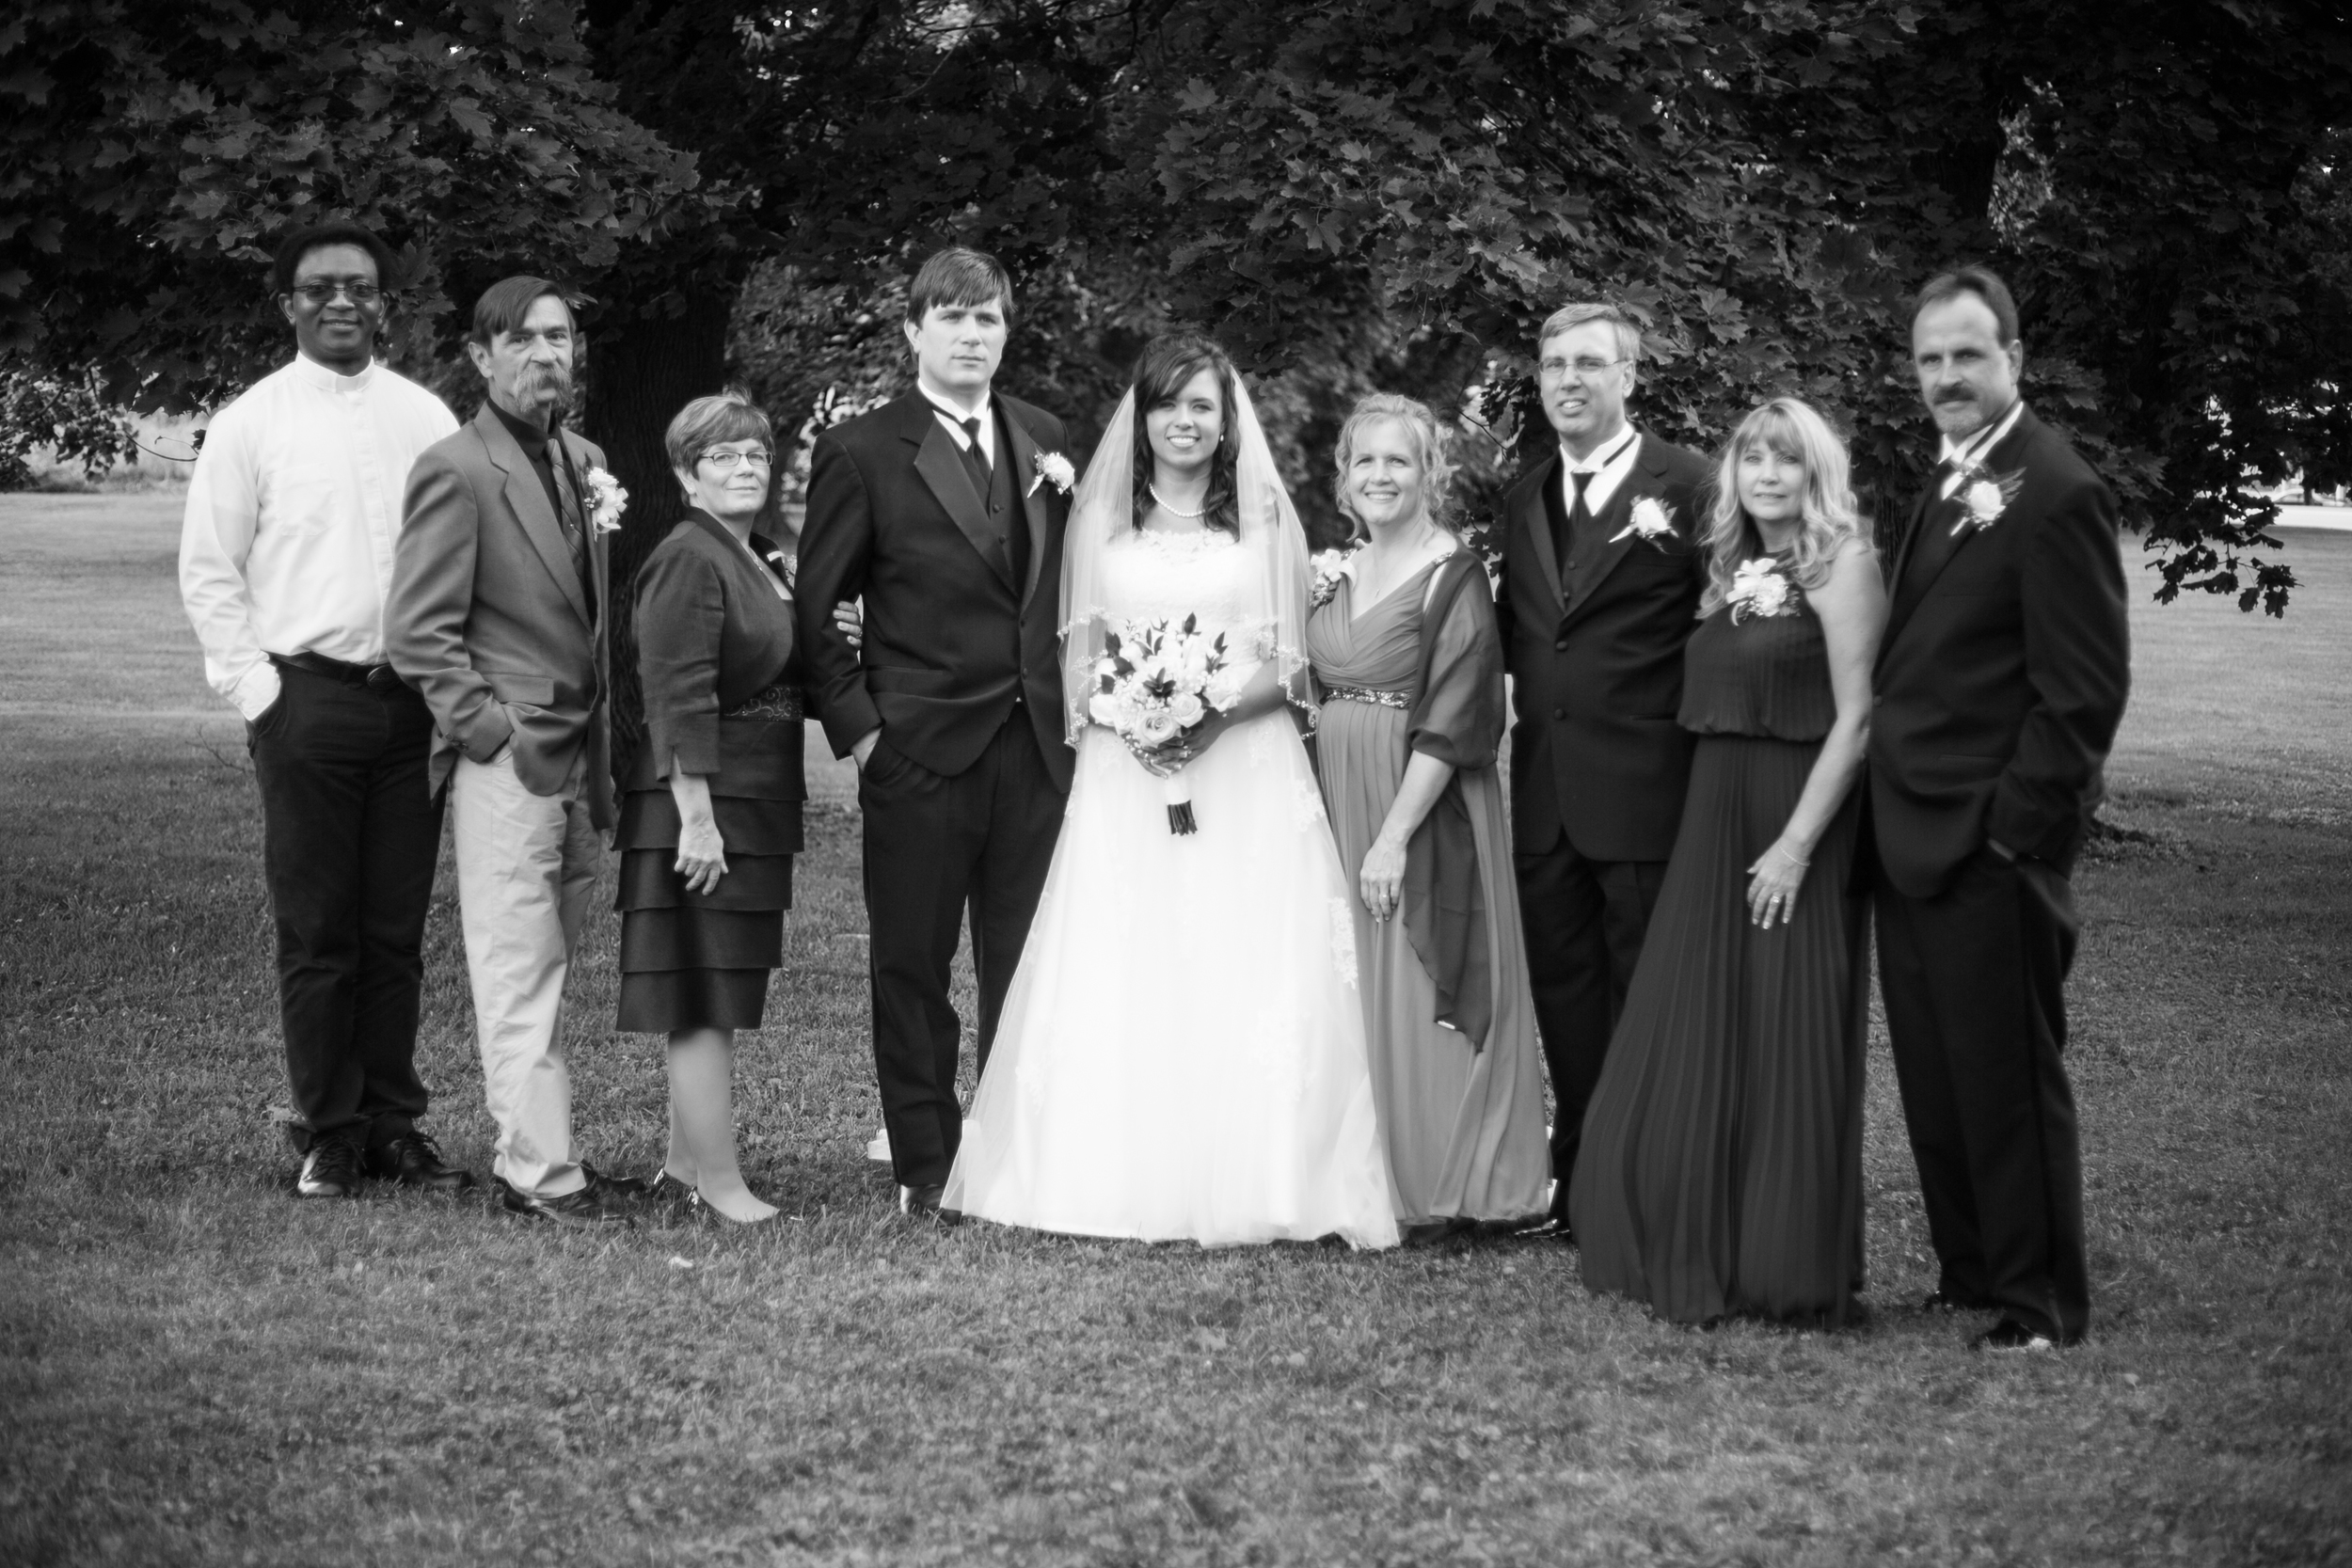 mary-brad-sizemore-wedding-naylor-vineyard-living-radiant-photography-2014-401.jpg